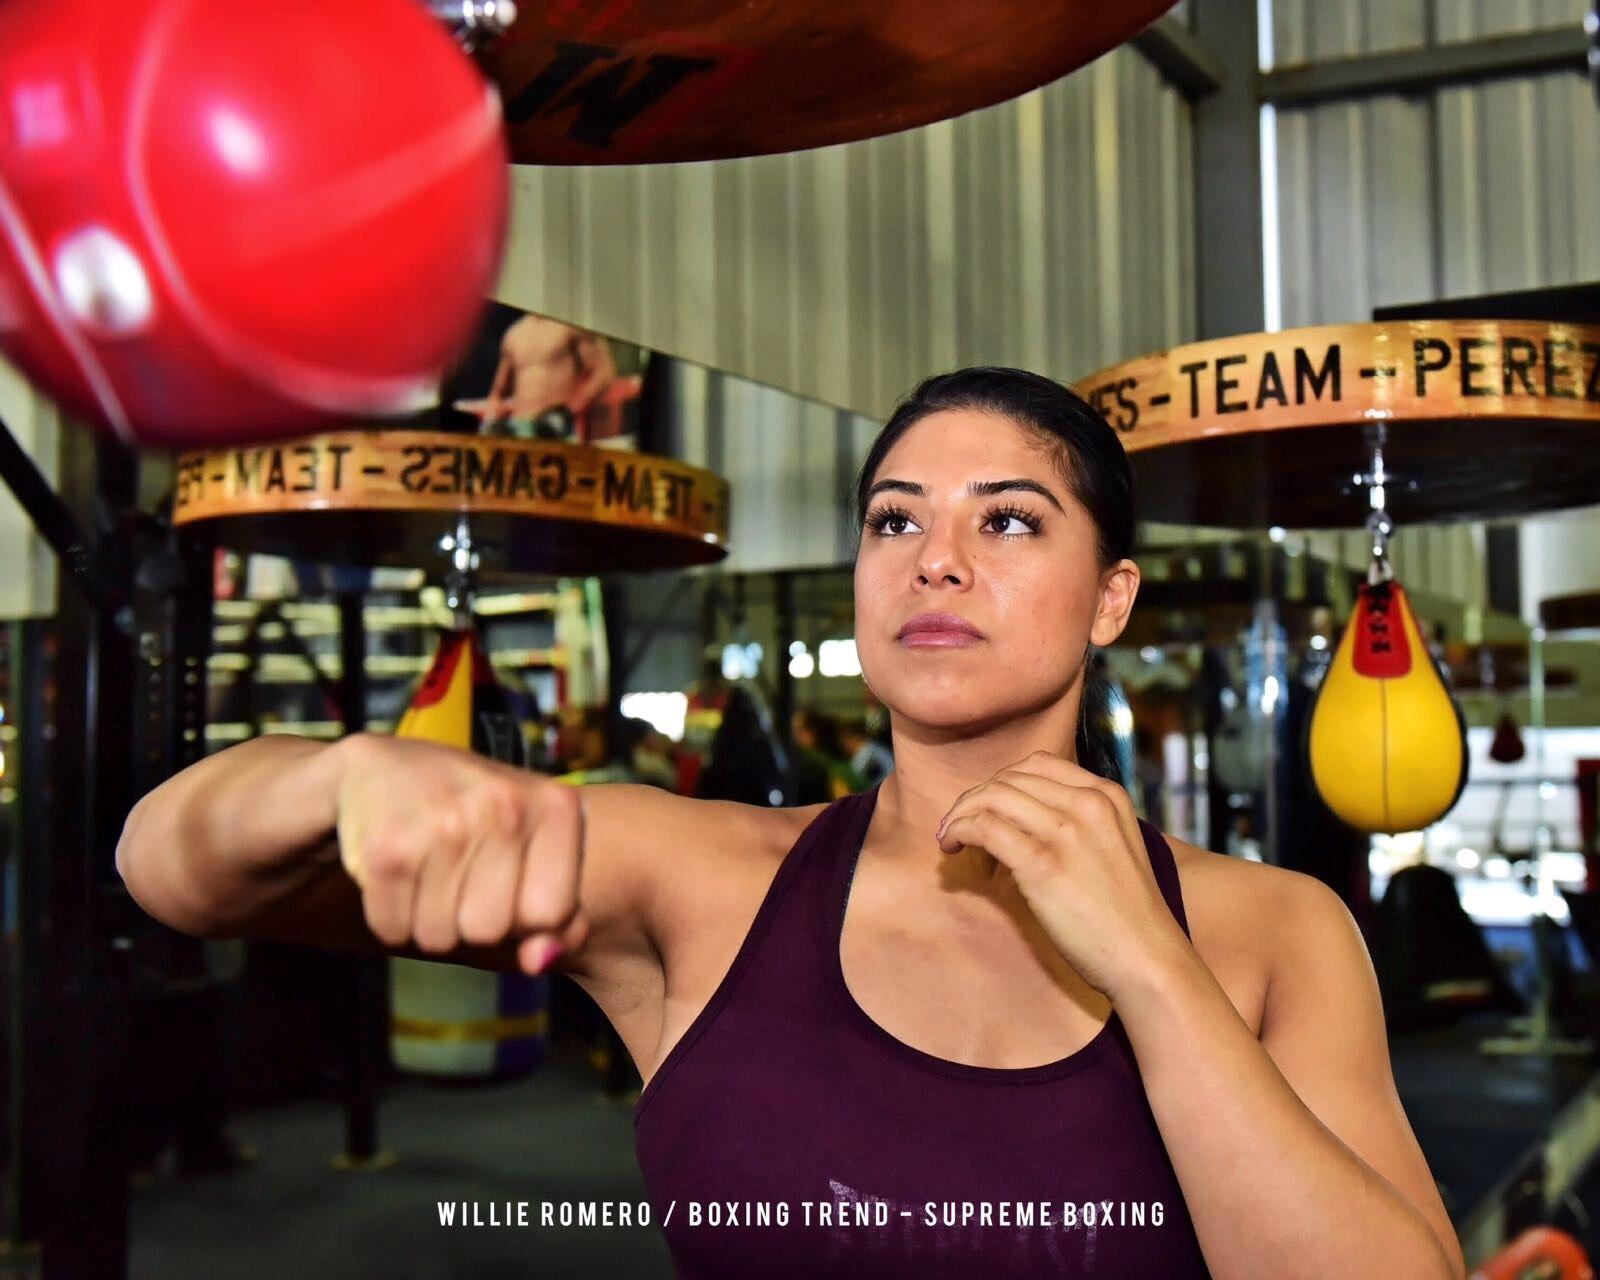 Photo: Willie Romero/Boxing Trend - Supreme Boxing